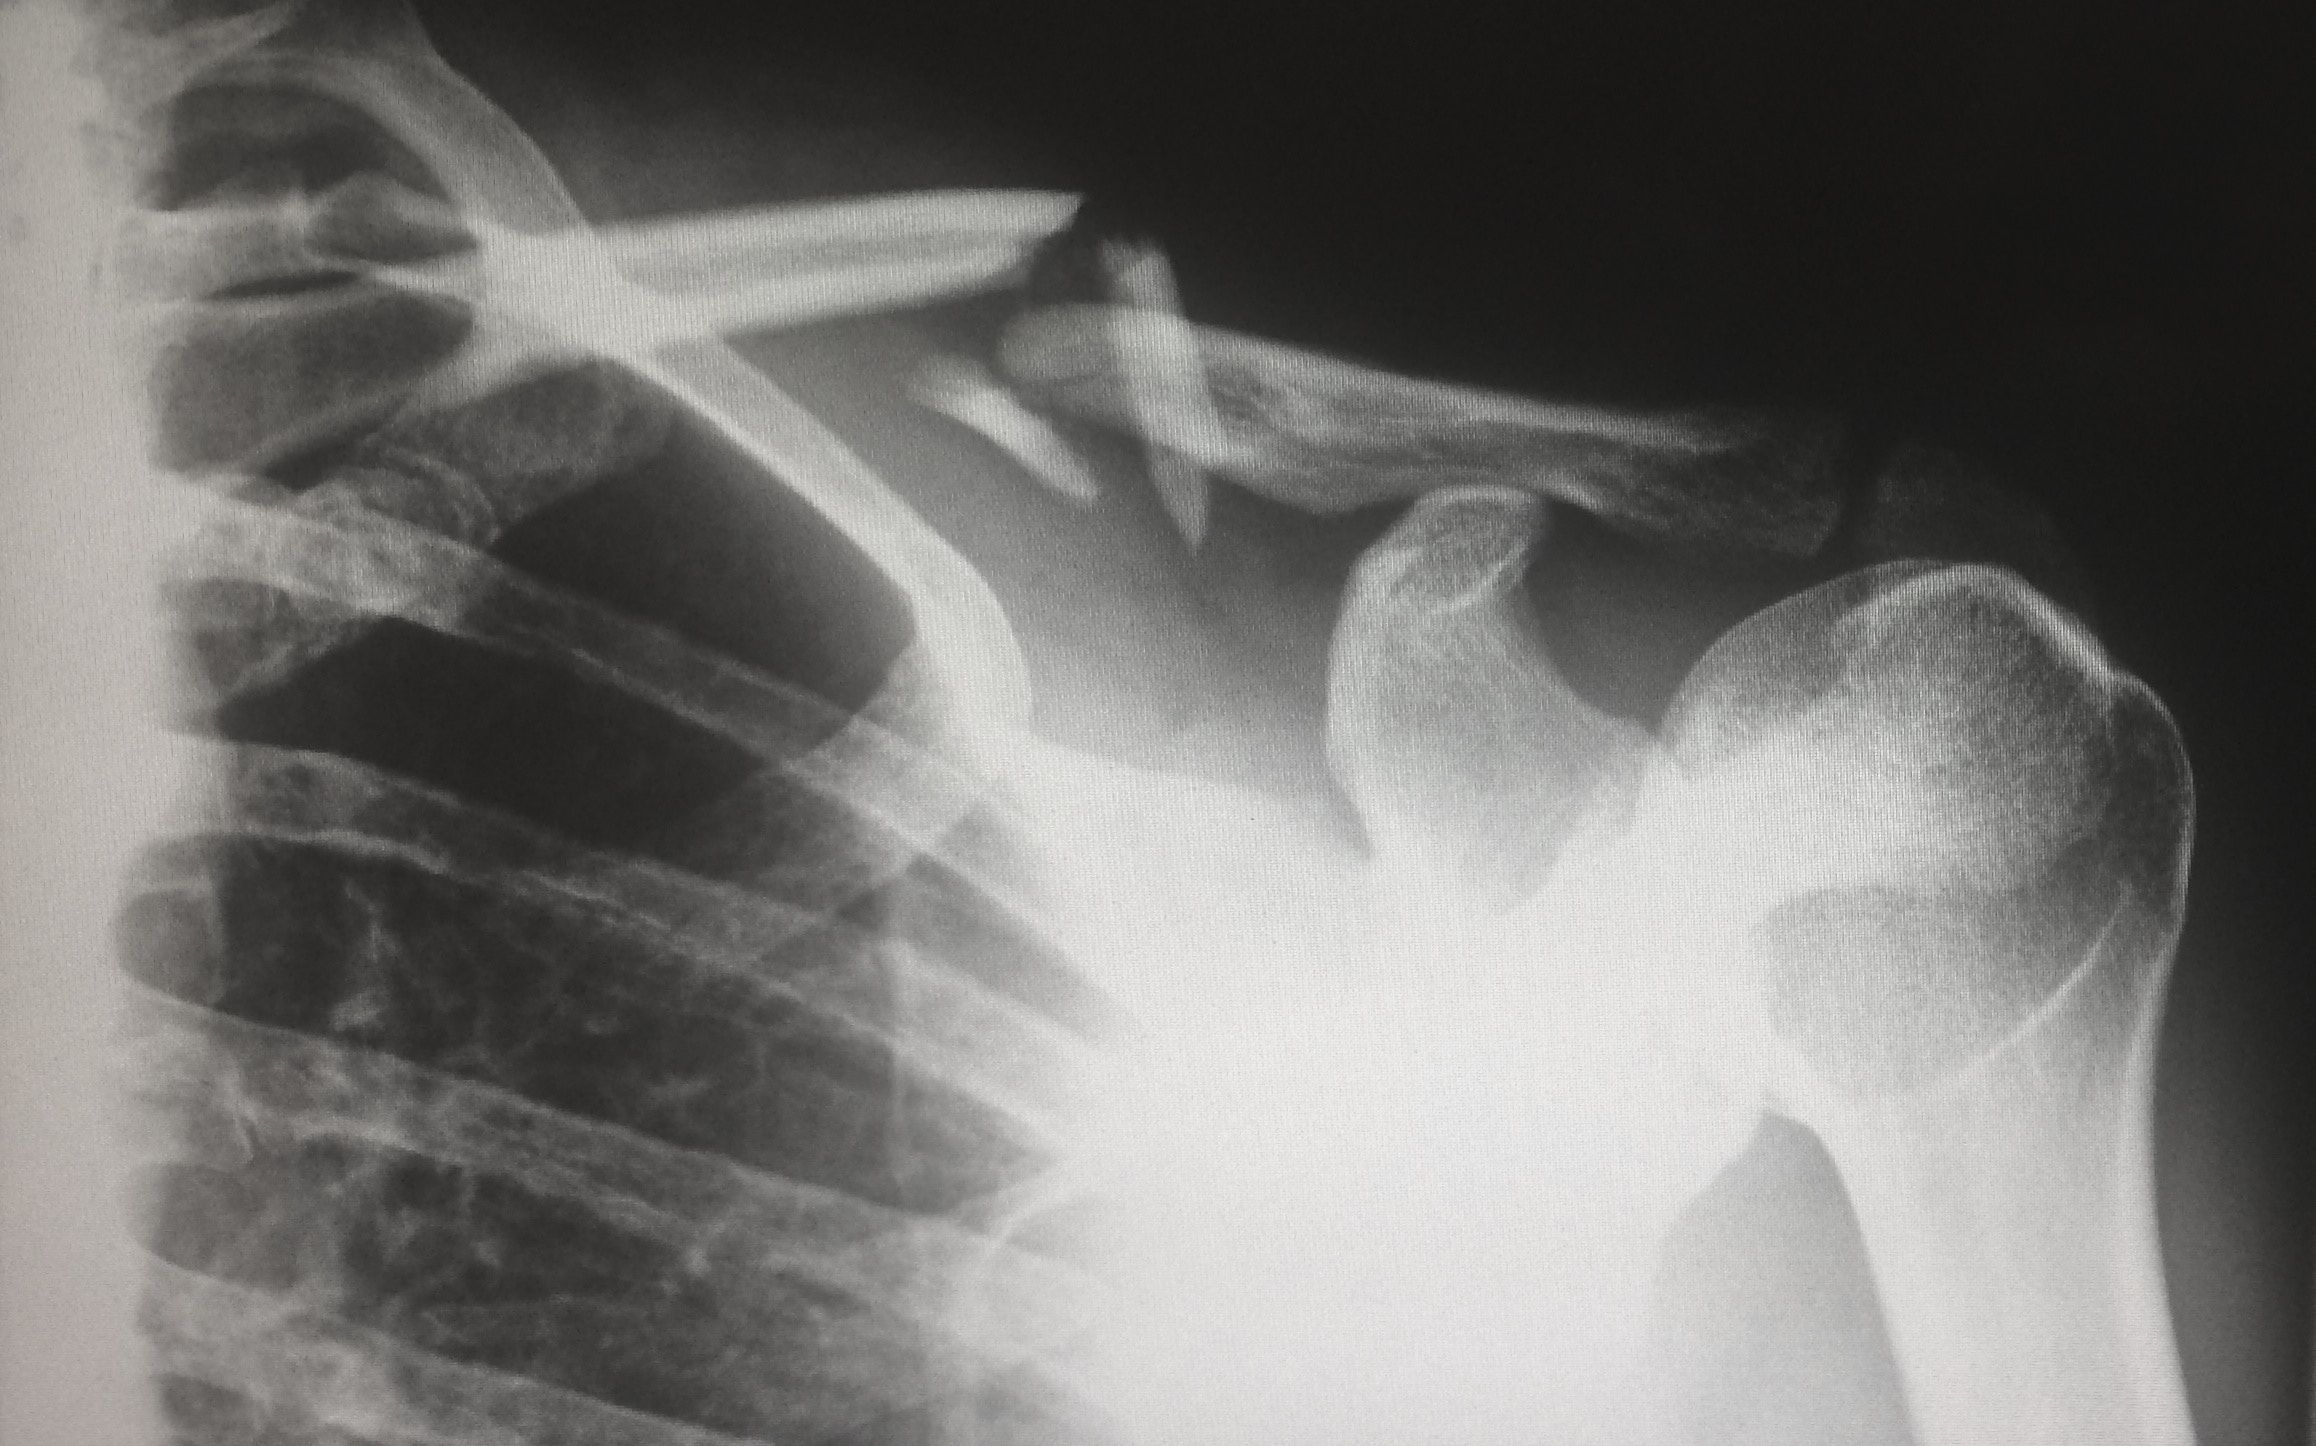 carcinoma prostatico metastasi osseo terapia la